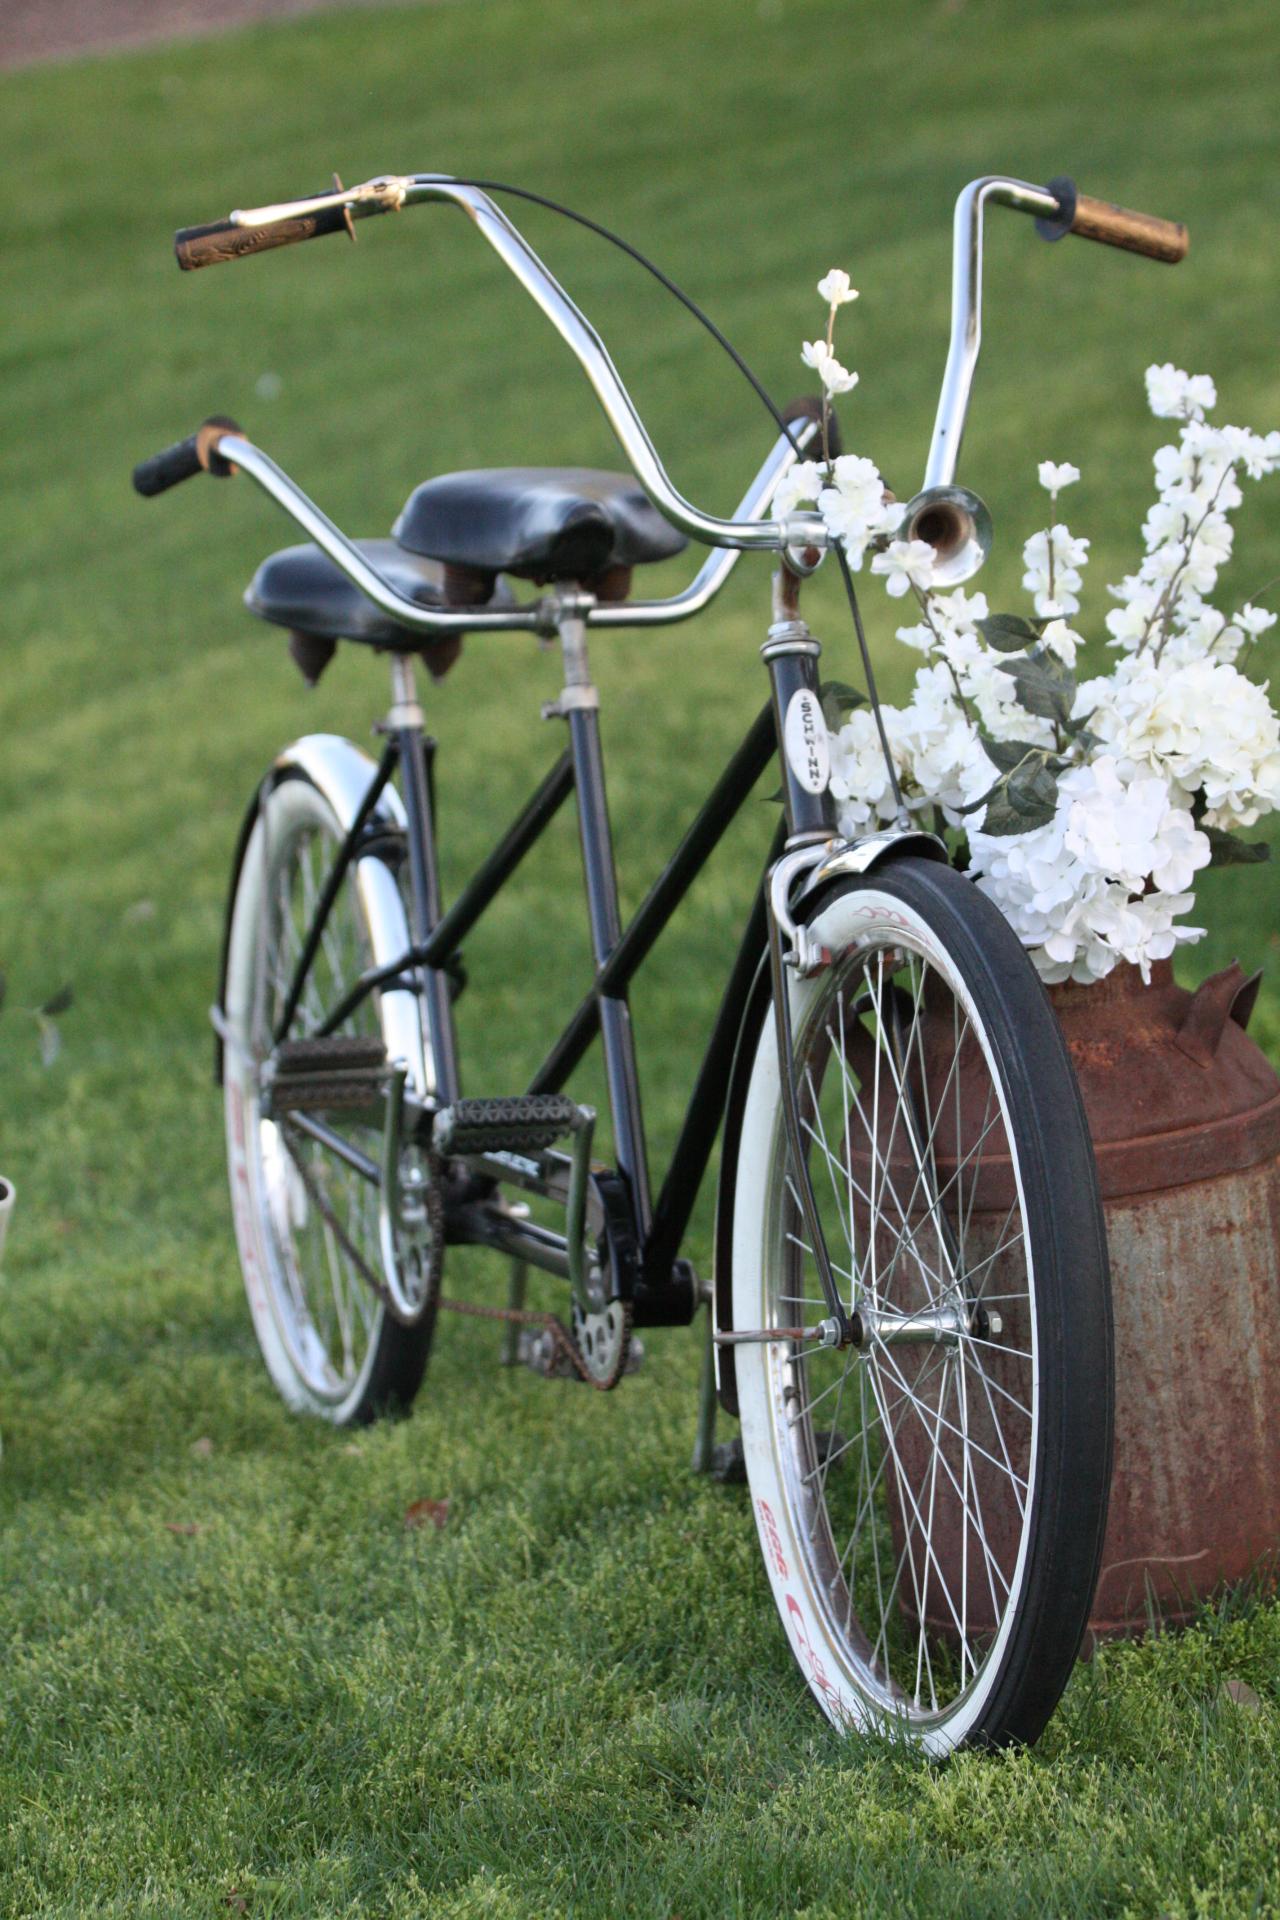 rent vintage tandem bicycle Edmonton wedding decor